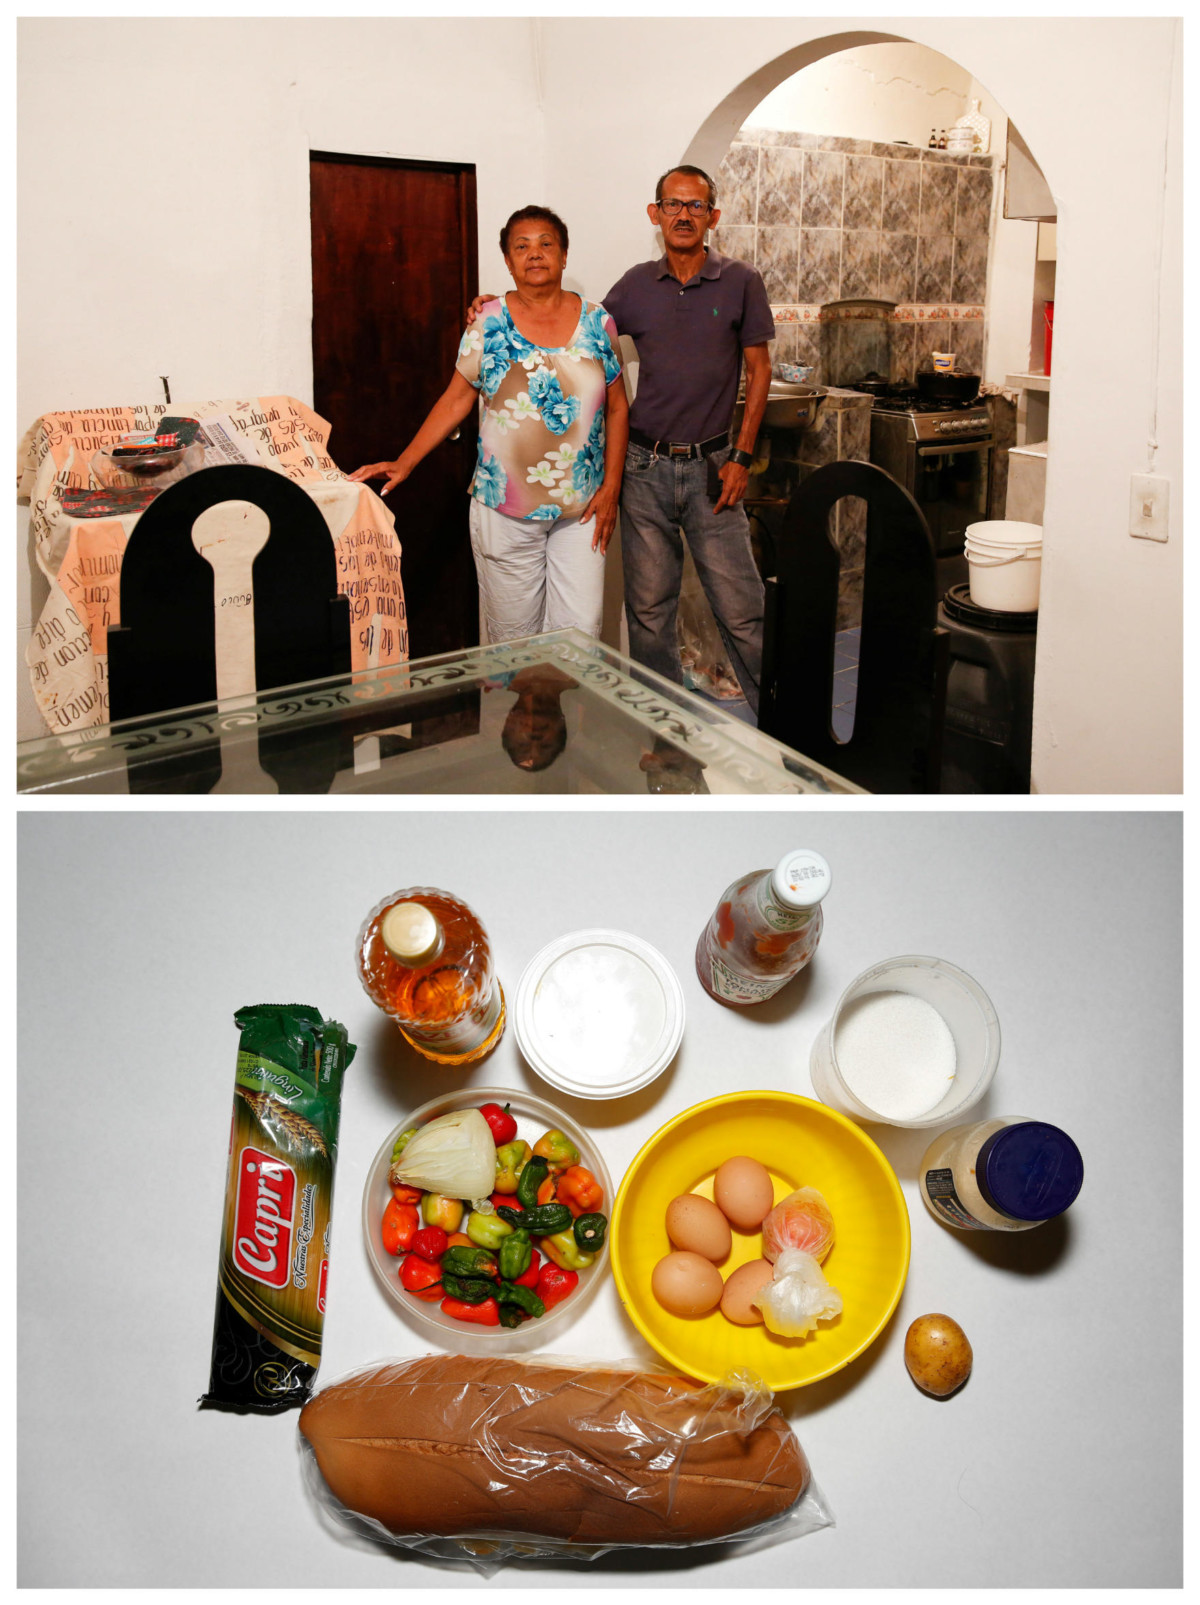 Mirella Rivero 母子:「我早餐食粟米麵包或者墨西哥粽,每日兩次。」